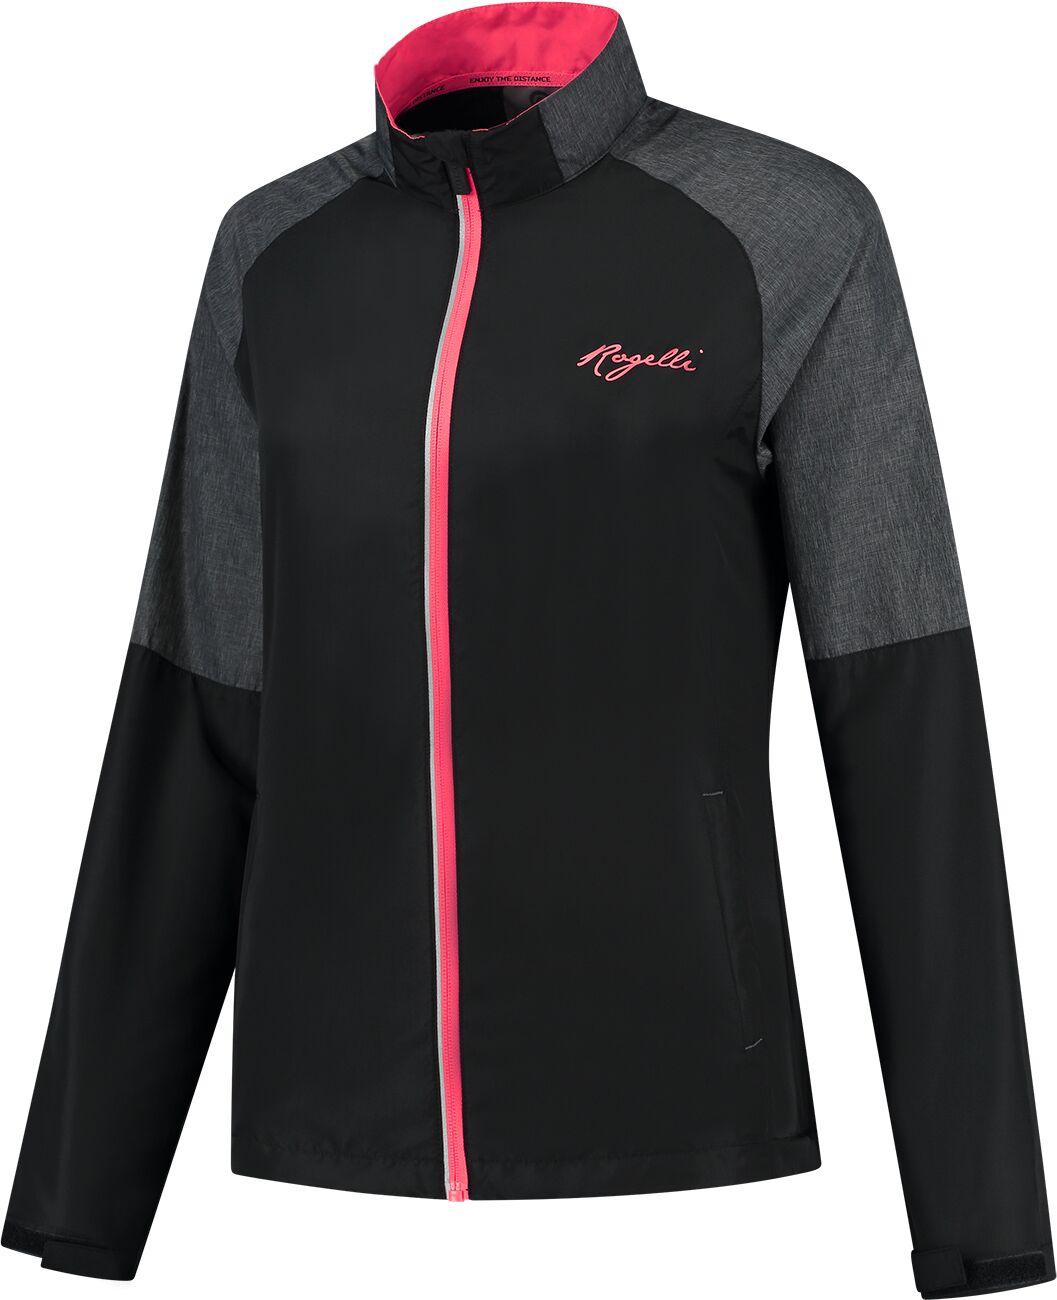 ROGELLI damska kurtka do biegania ENJOY black ROG351112 Rozmiar: L,ROG351112.XS